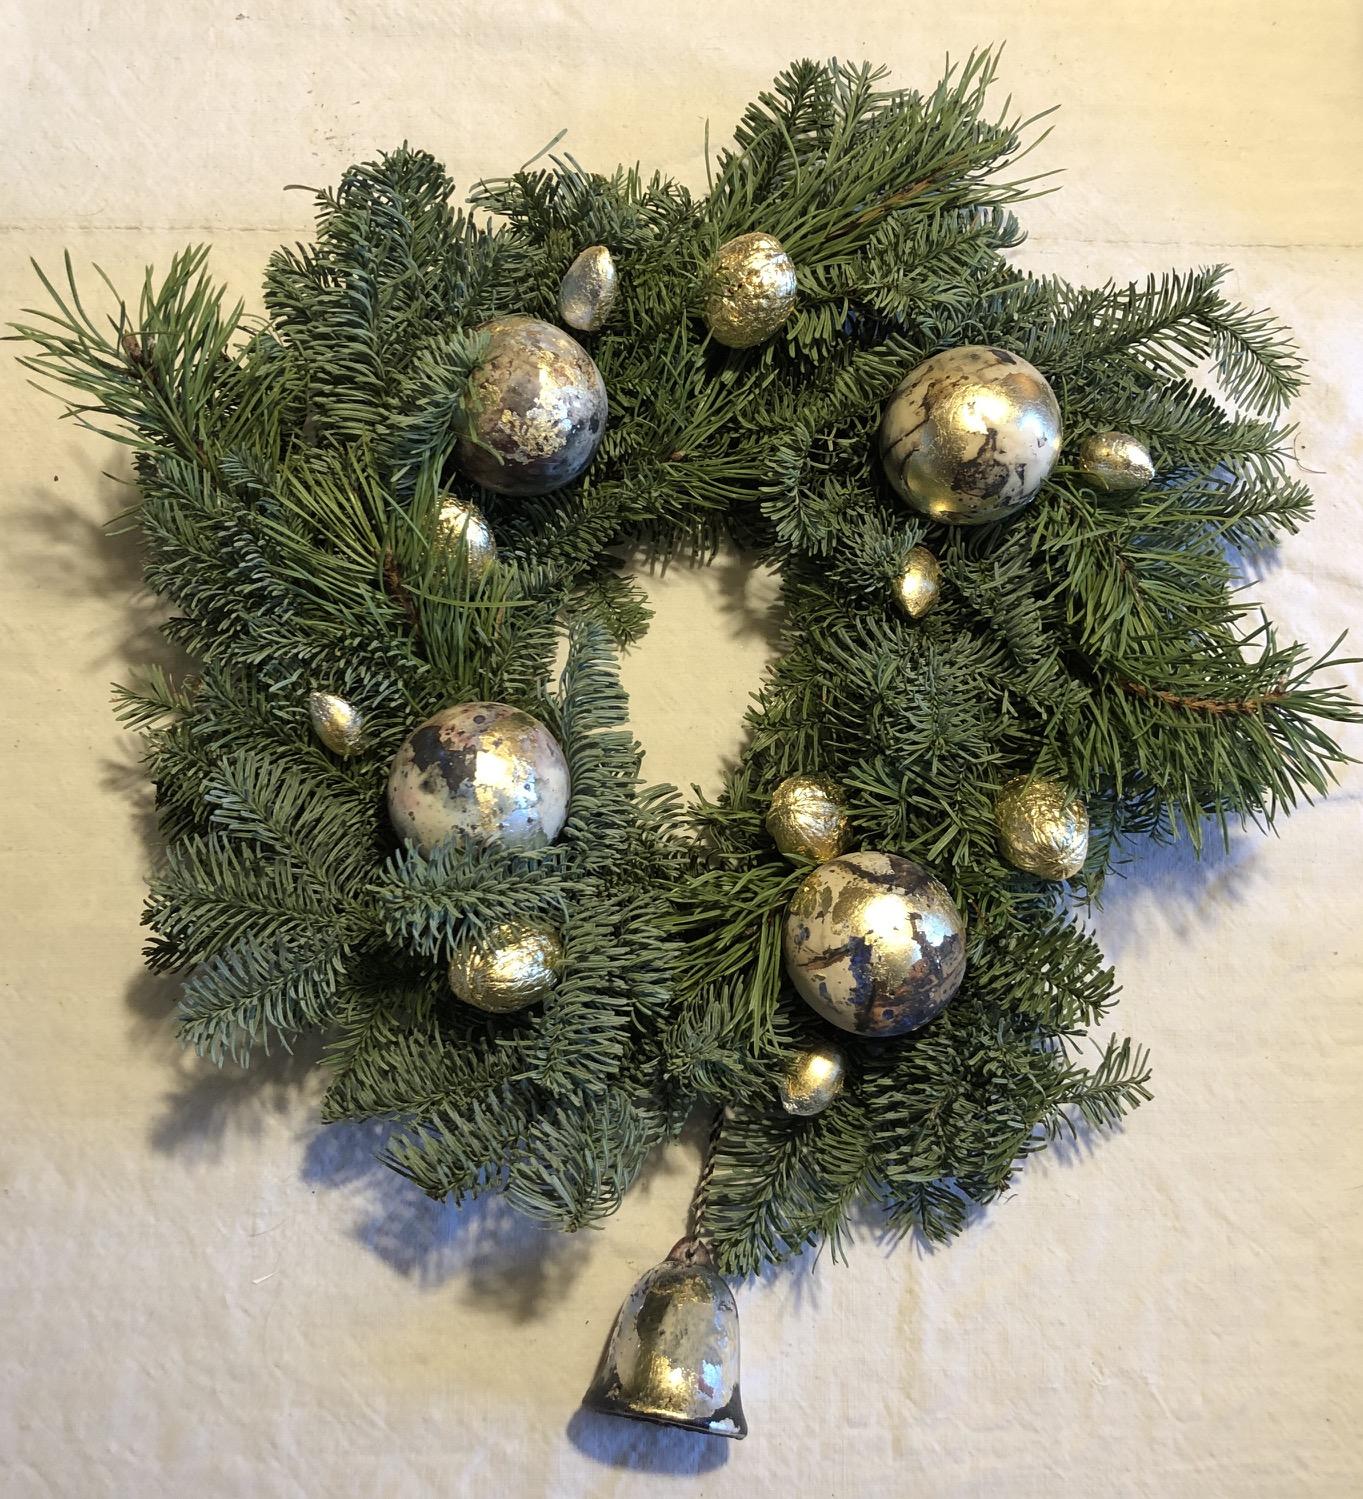 Merry Christmas Creative Souls...